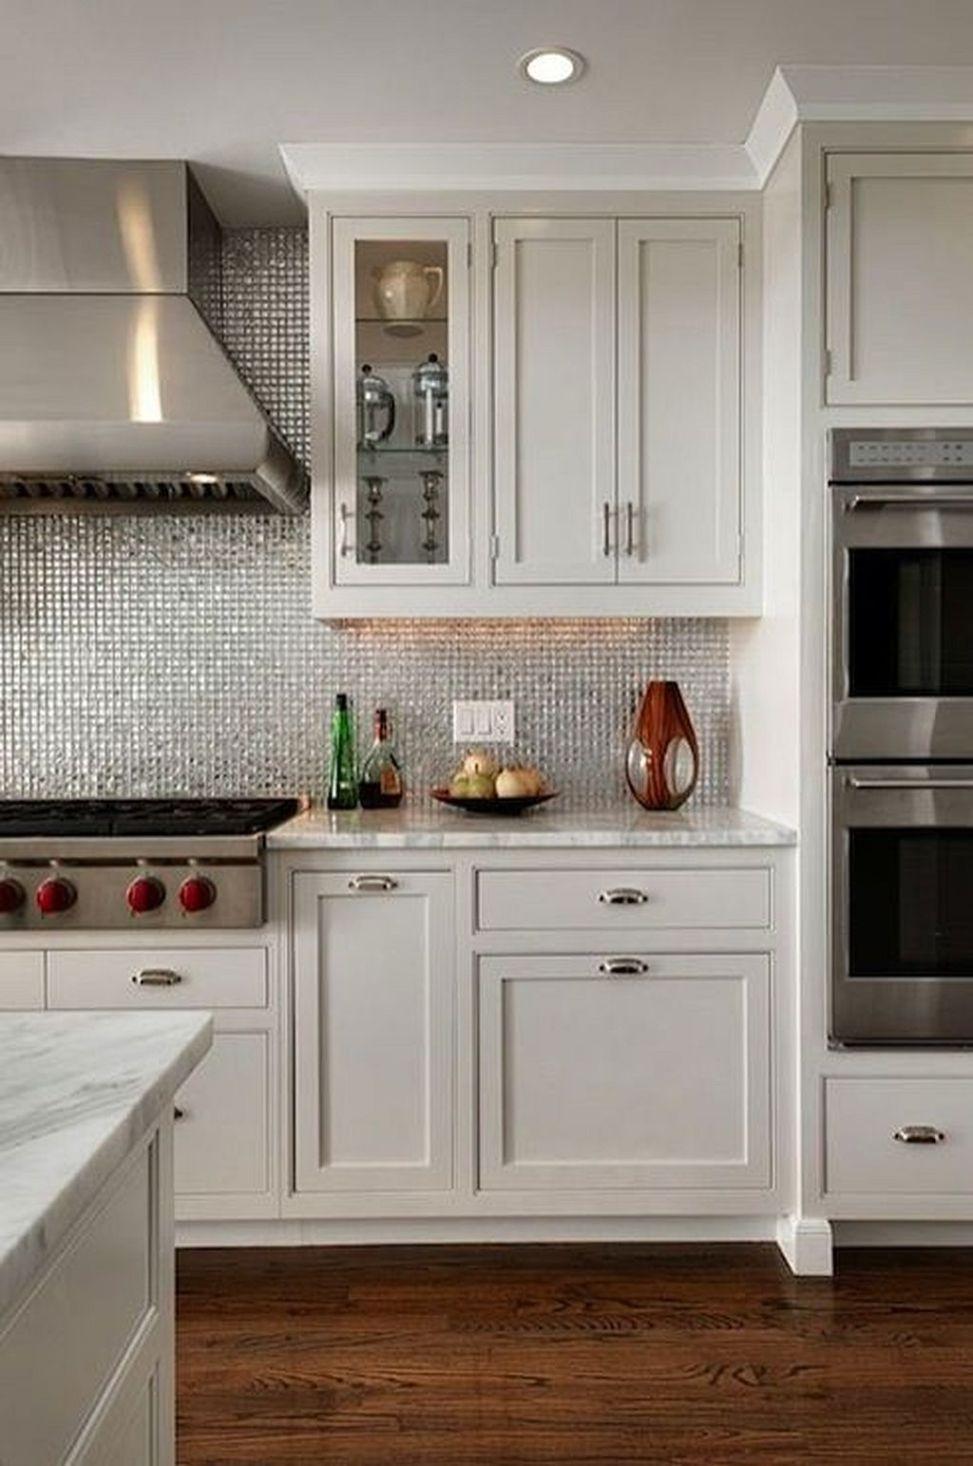 Modern white kitchen cabinets and backsplash design ideas42